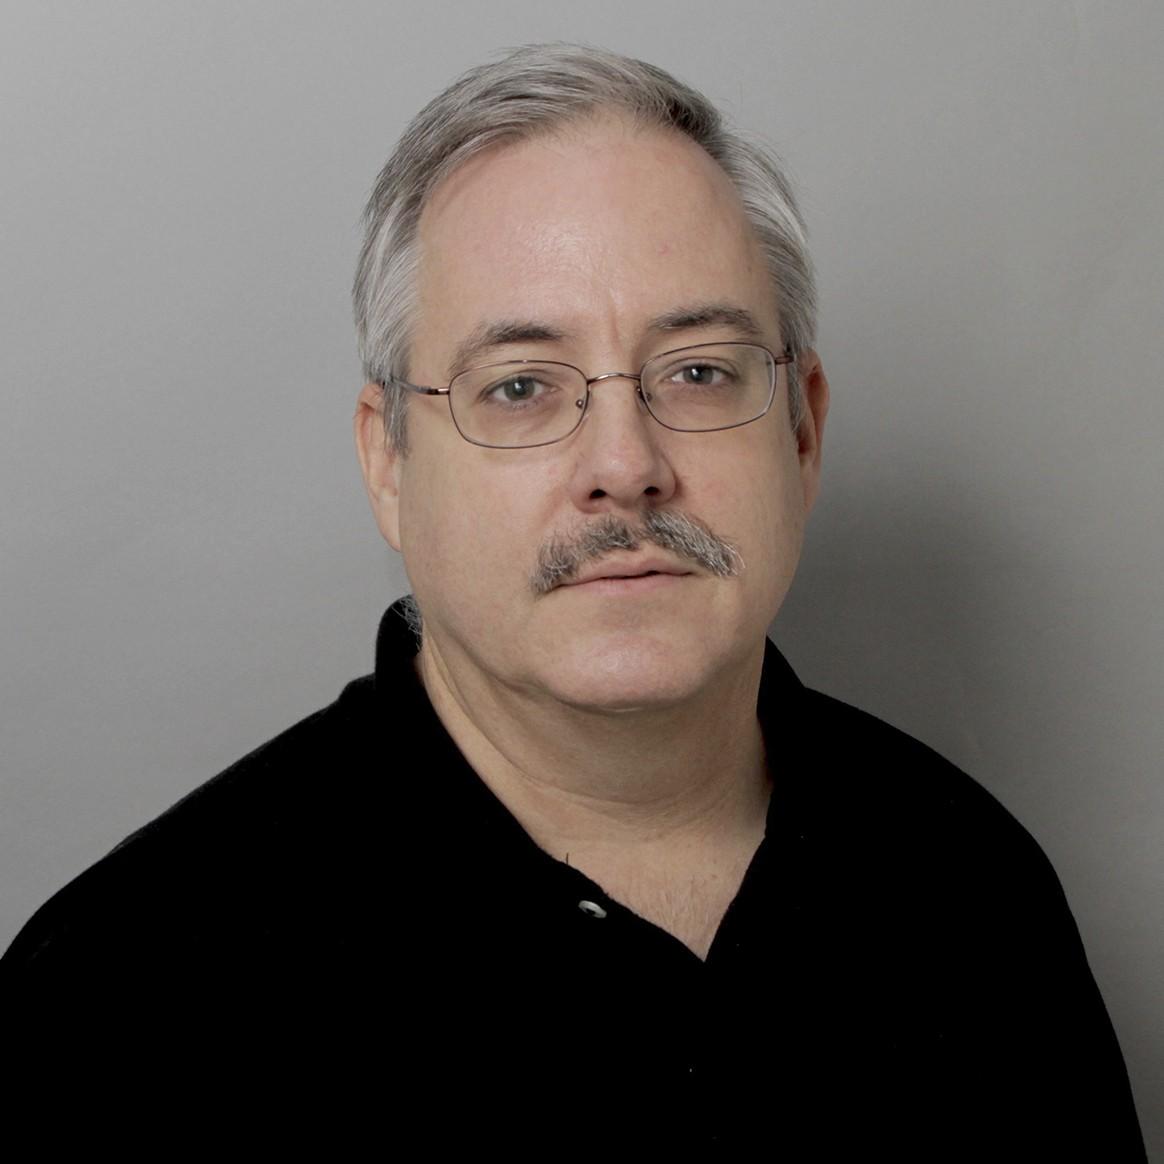 Headshot of Penn State Landscape Architecture Associate Professor Stuart Patton Echols